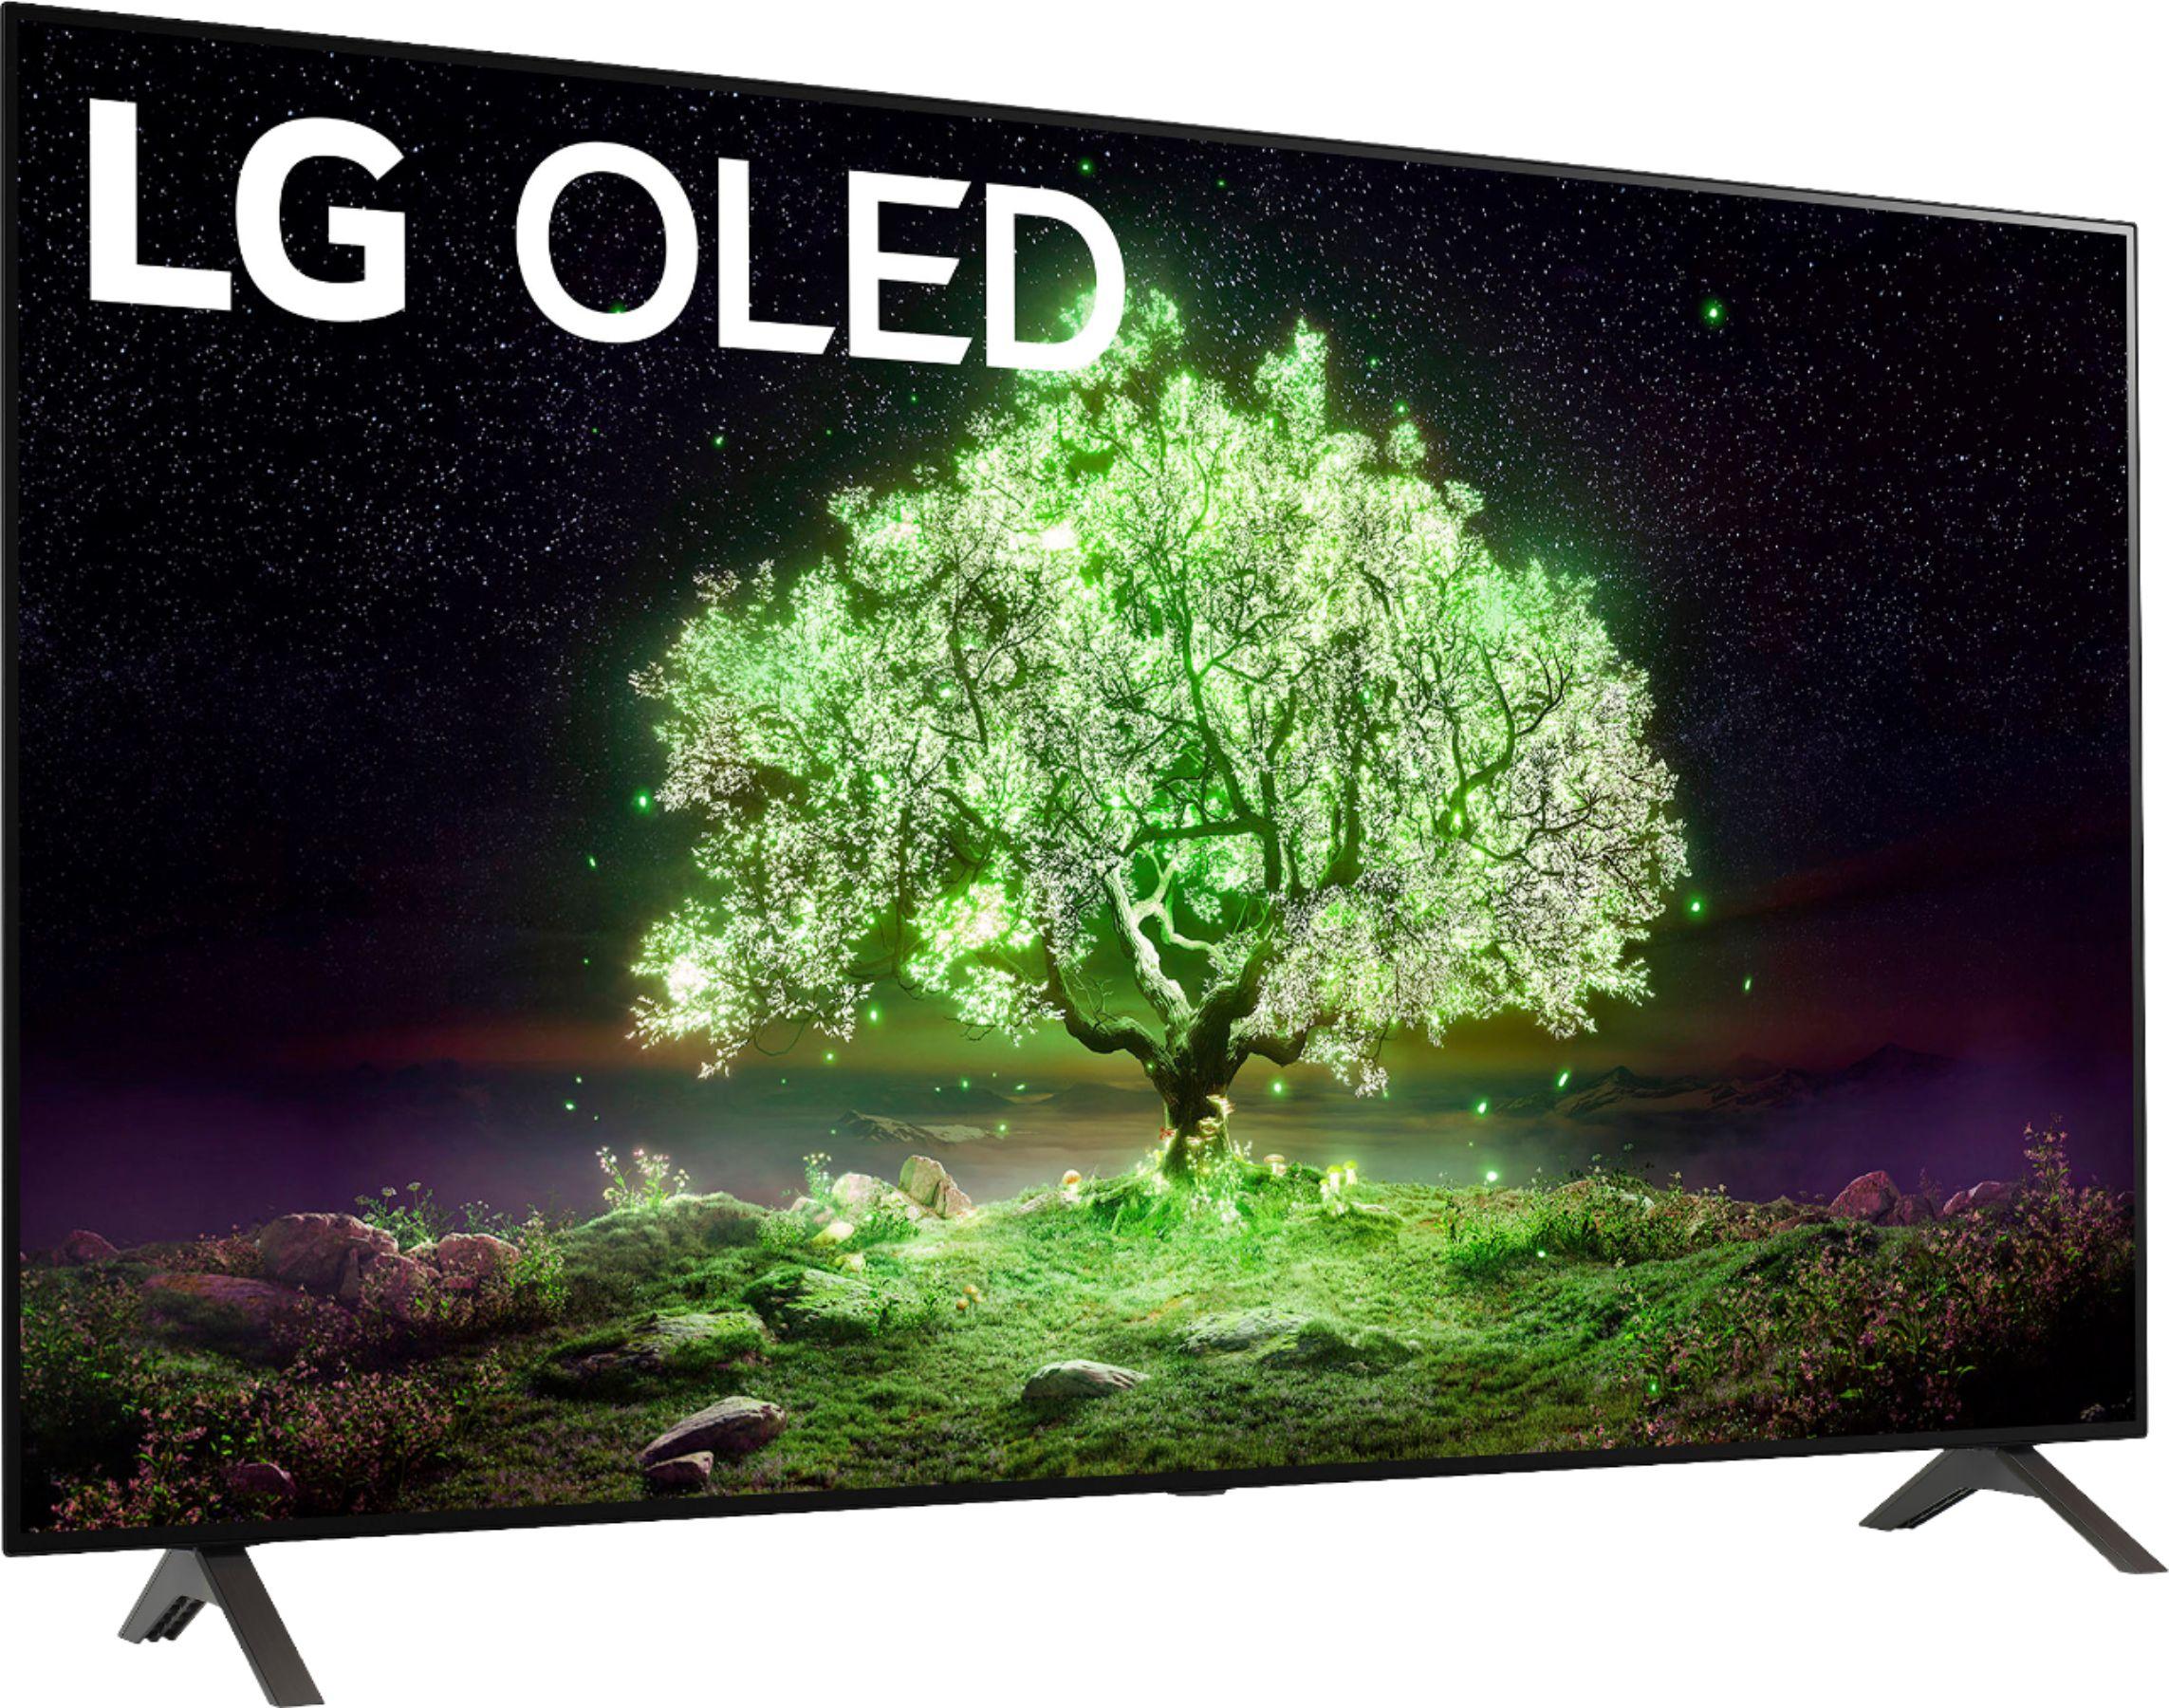 55-inch LG A1 OLED 4K TV